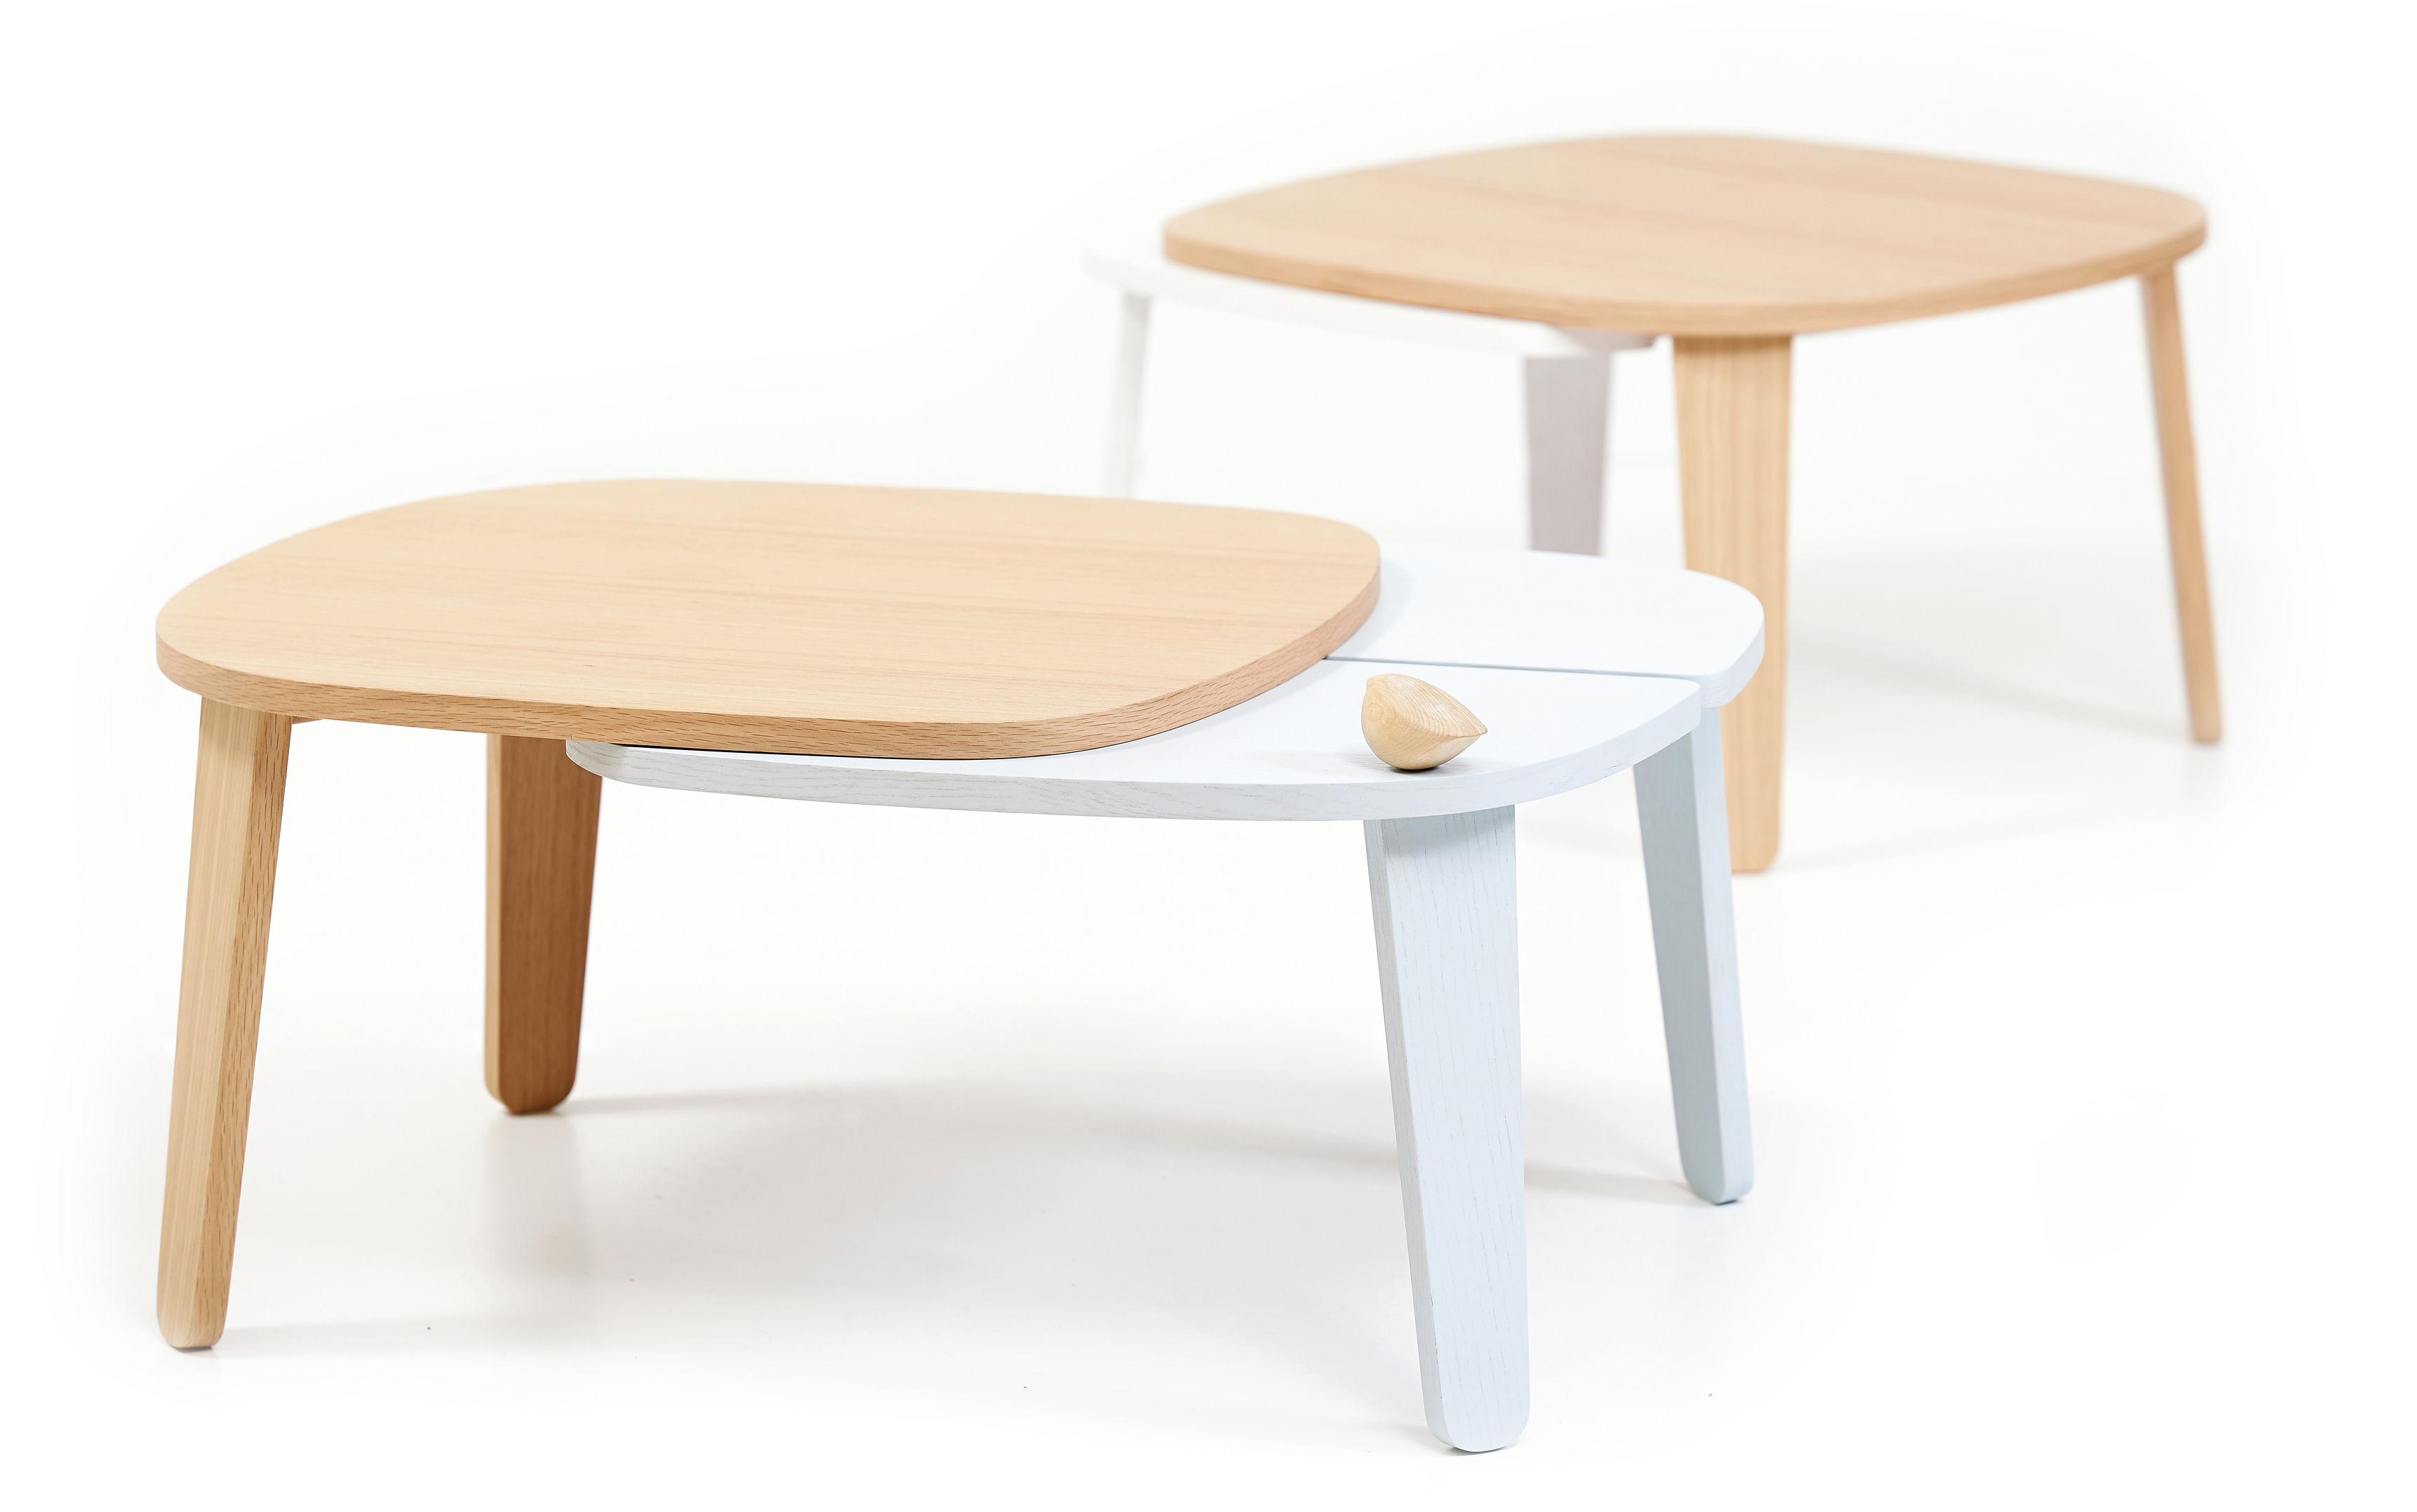 table basse colette longueur ajustable ch ne extension blanche hart. Black Bedroom Furniture Sets. Home Design Ideas